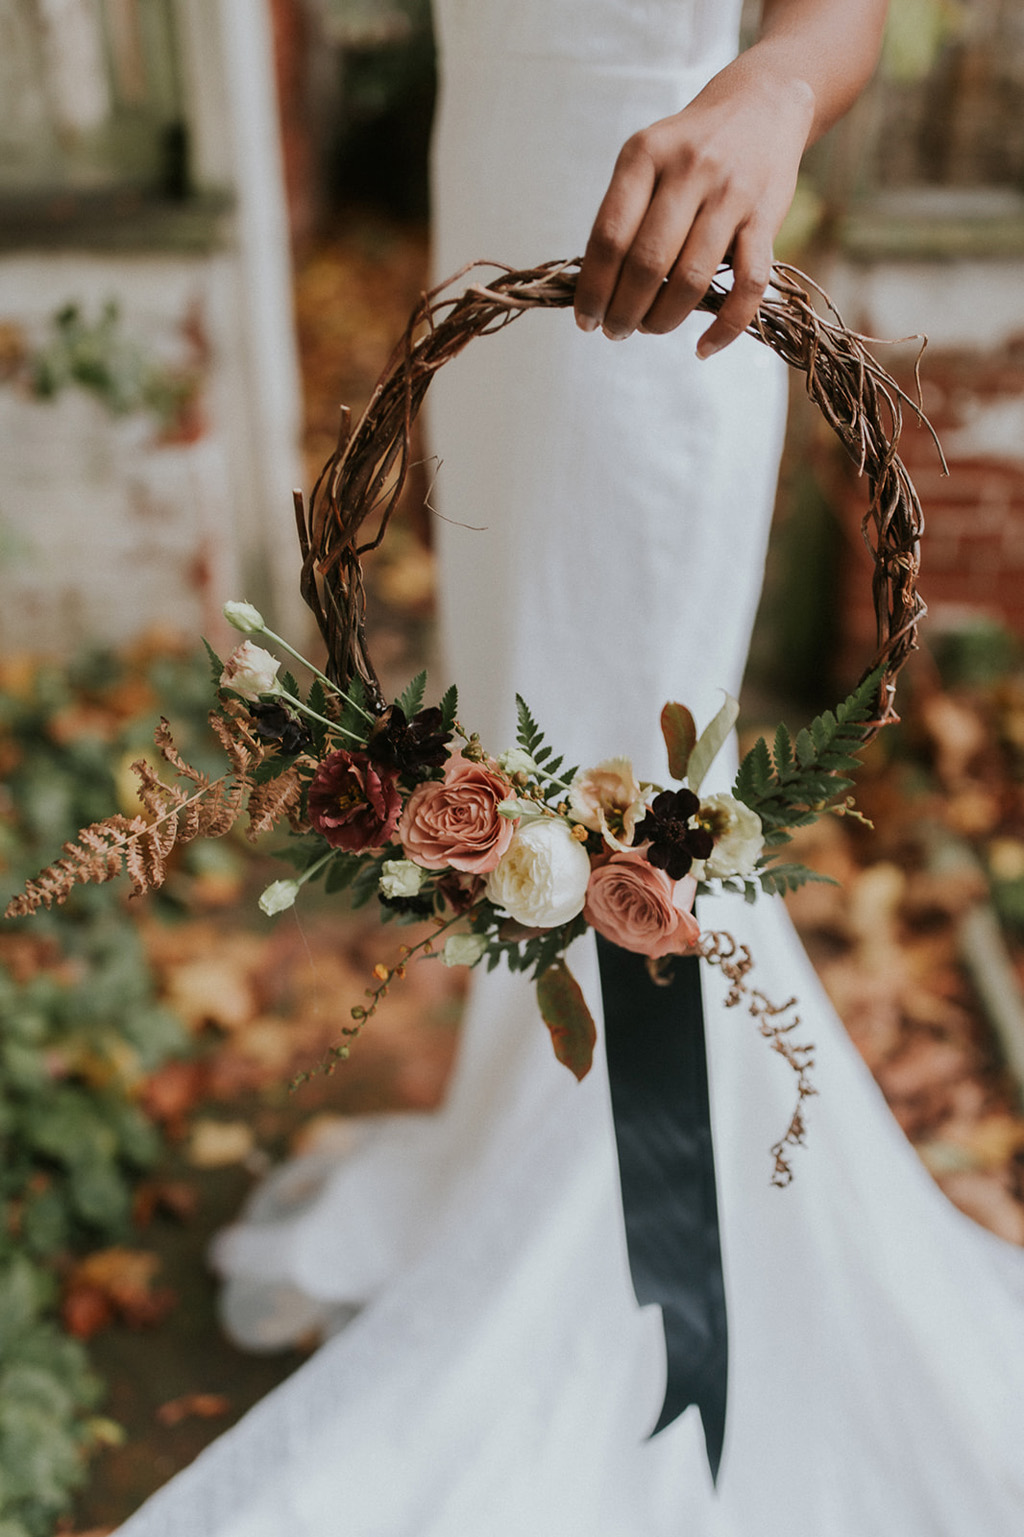 Modern hoop wedding bouquet, image credit Lianne Gray Photography